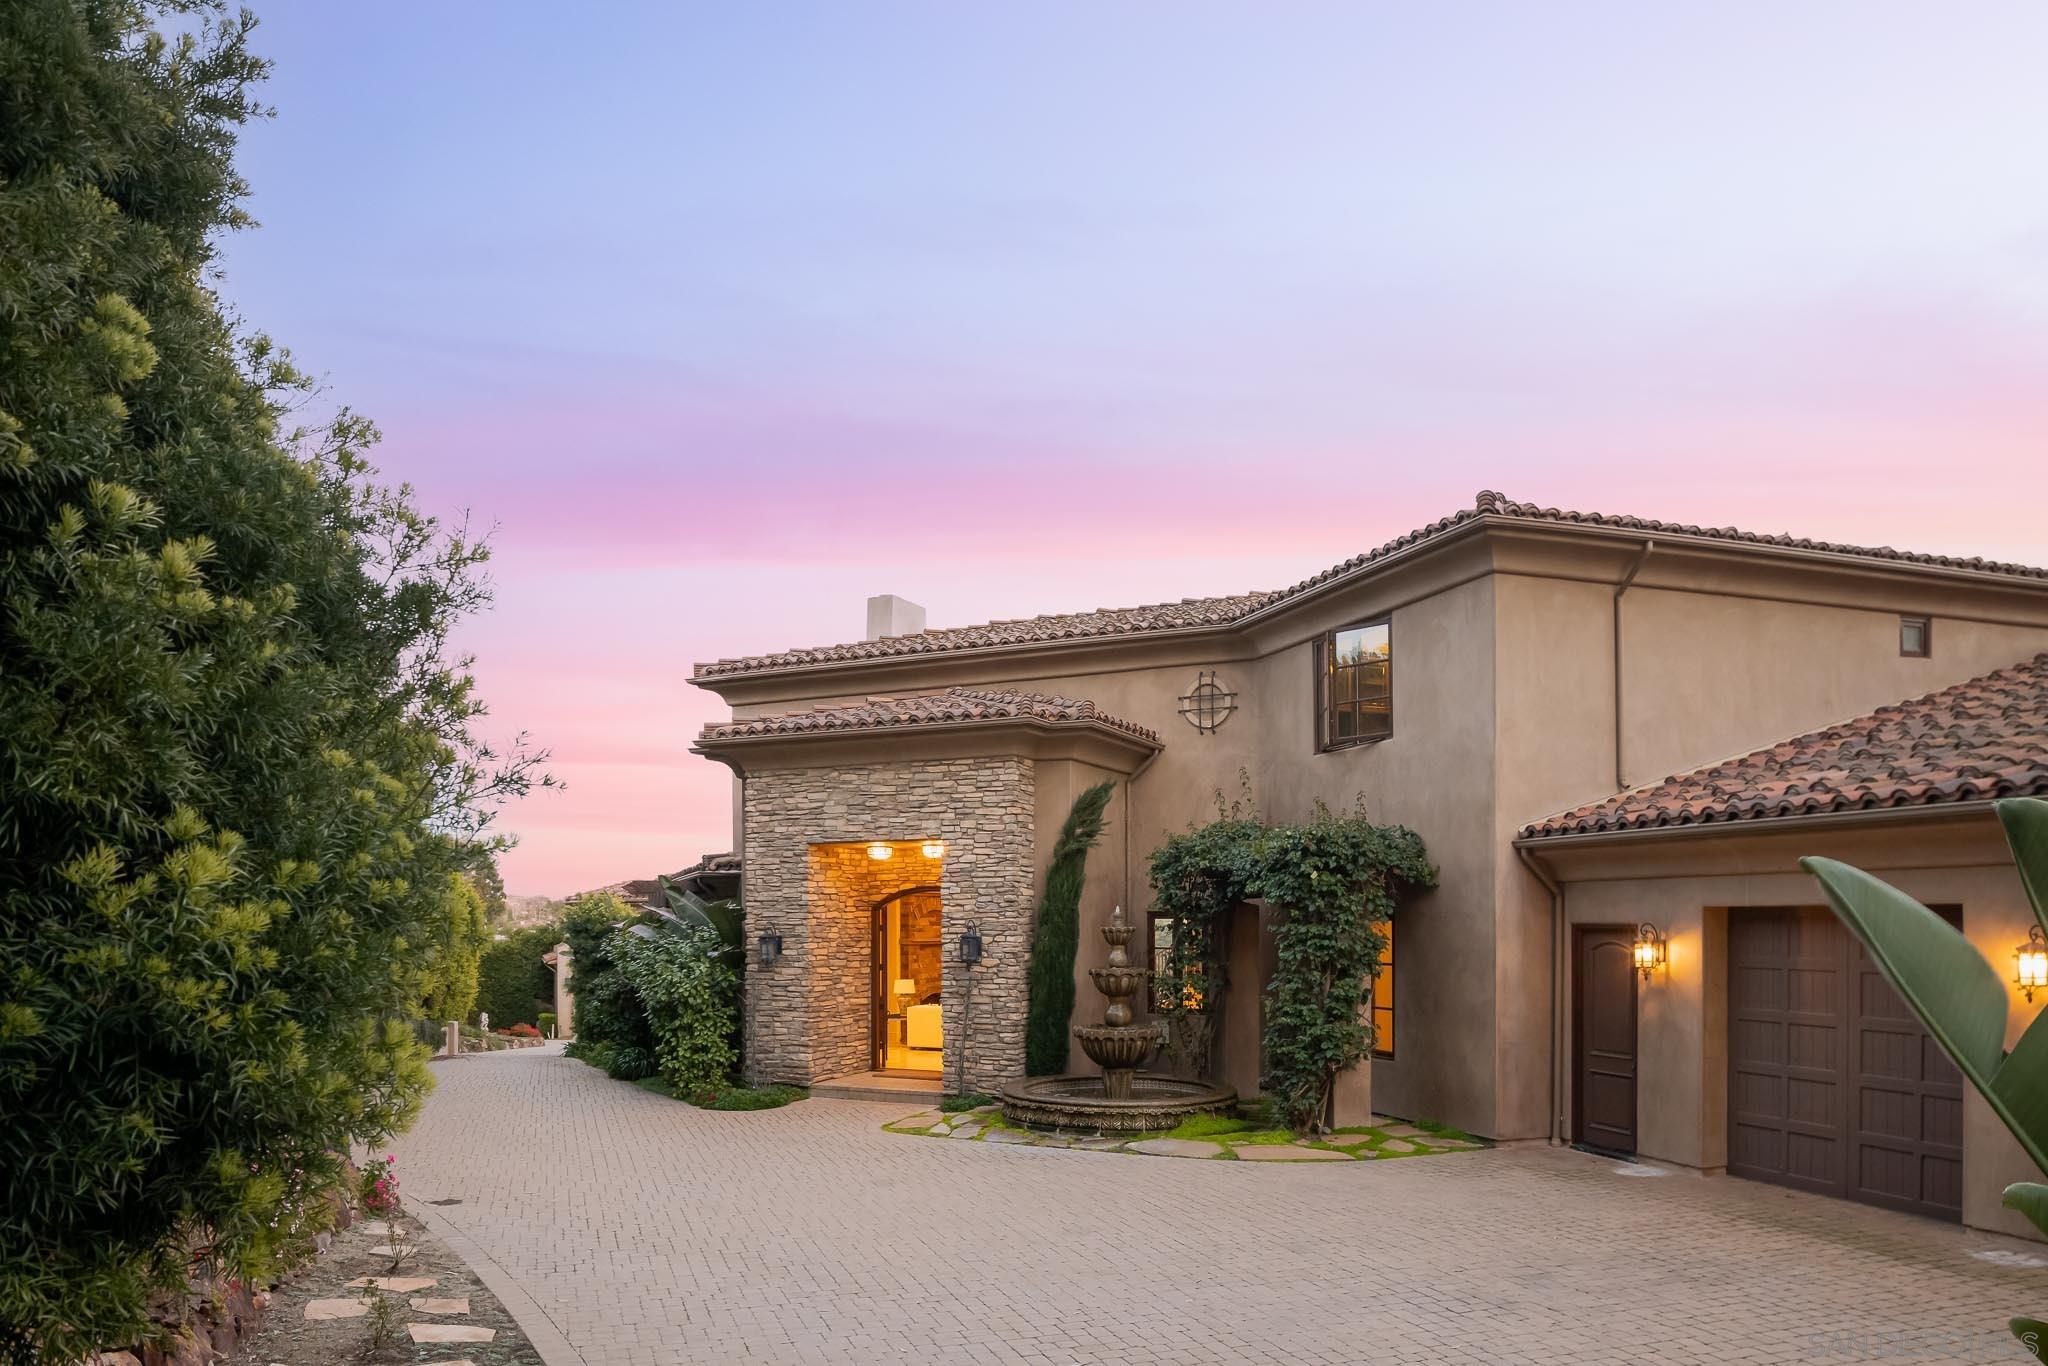 5171 Del Mar Mesa Rd, San Diego, CA 92130